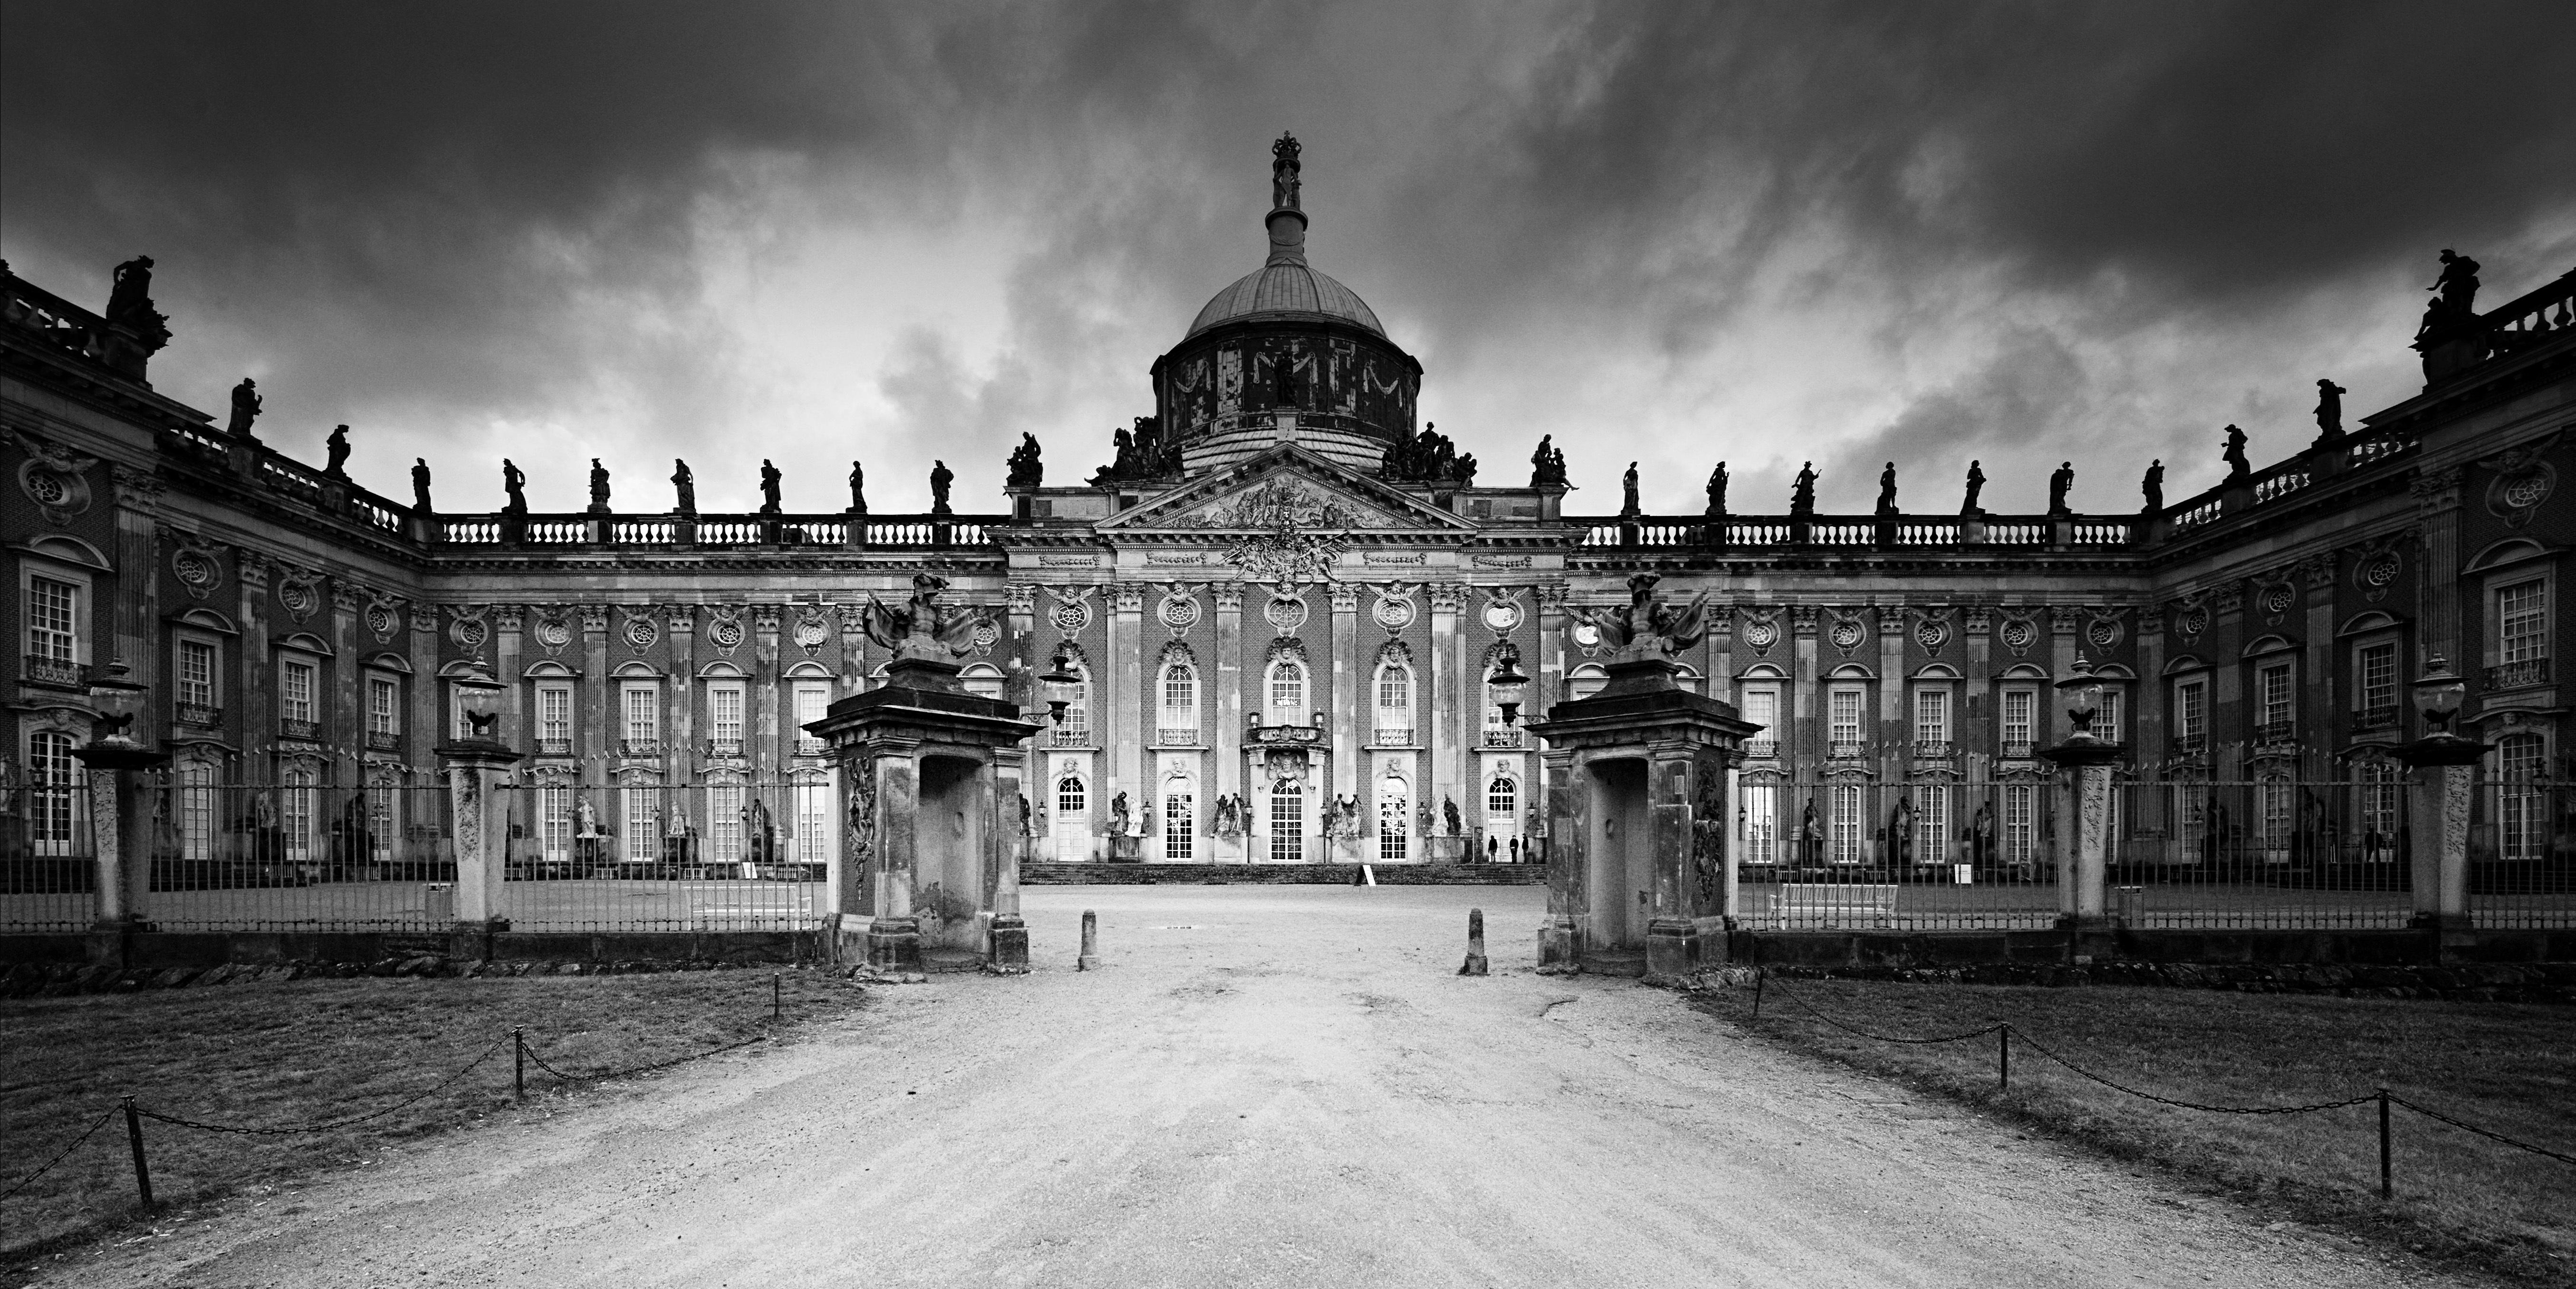 Бесплатный онлайн редактор фото 35×45 мм на загранпаспорт